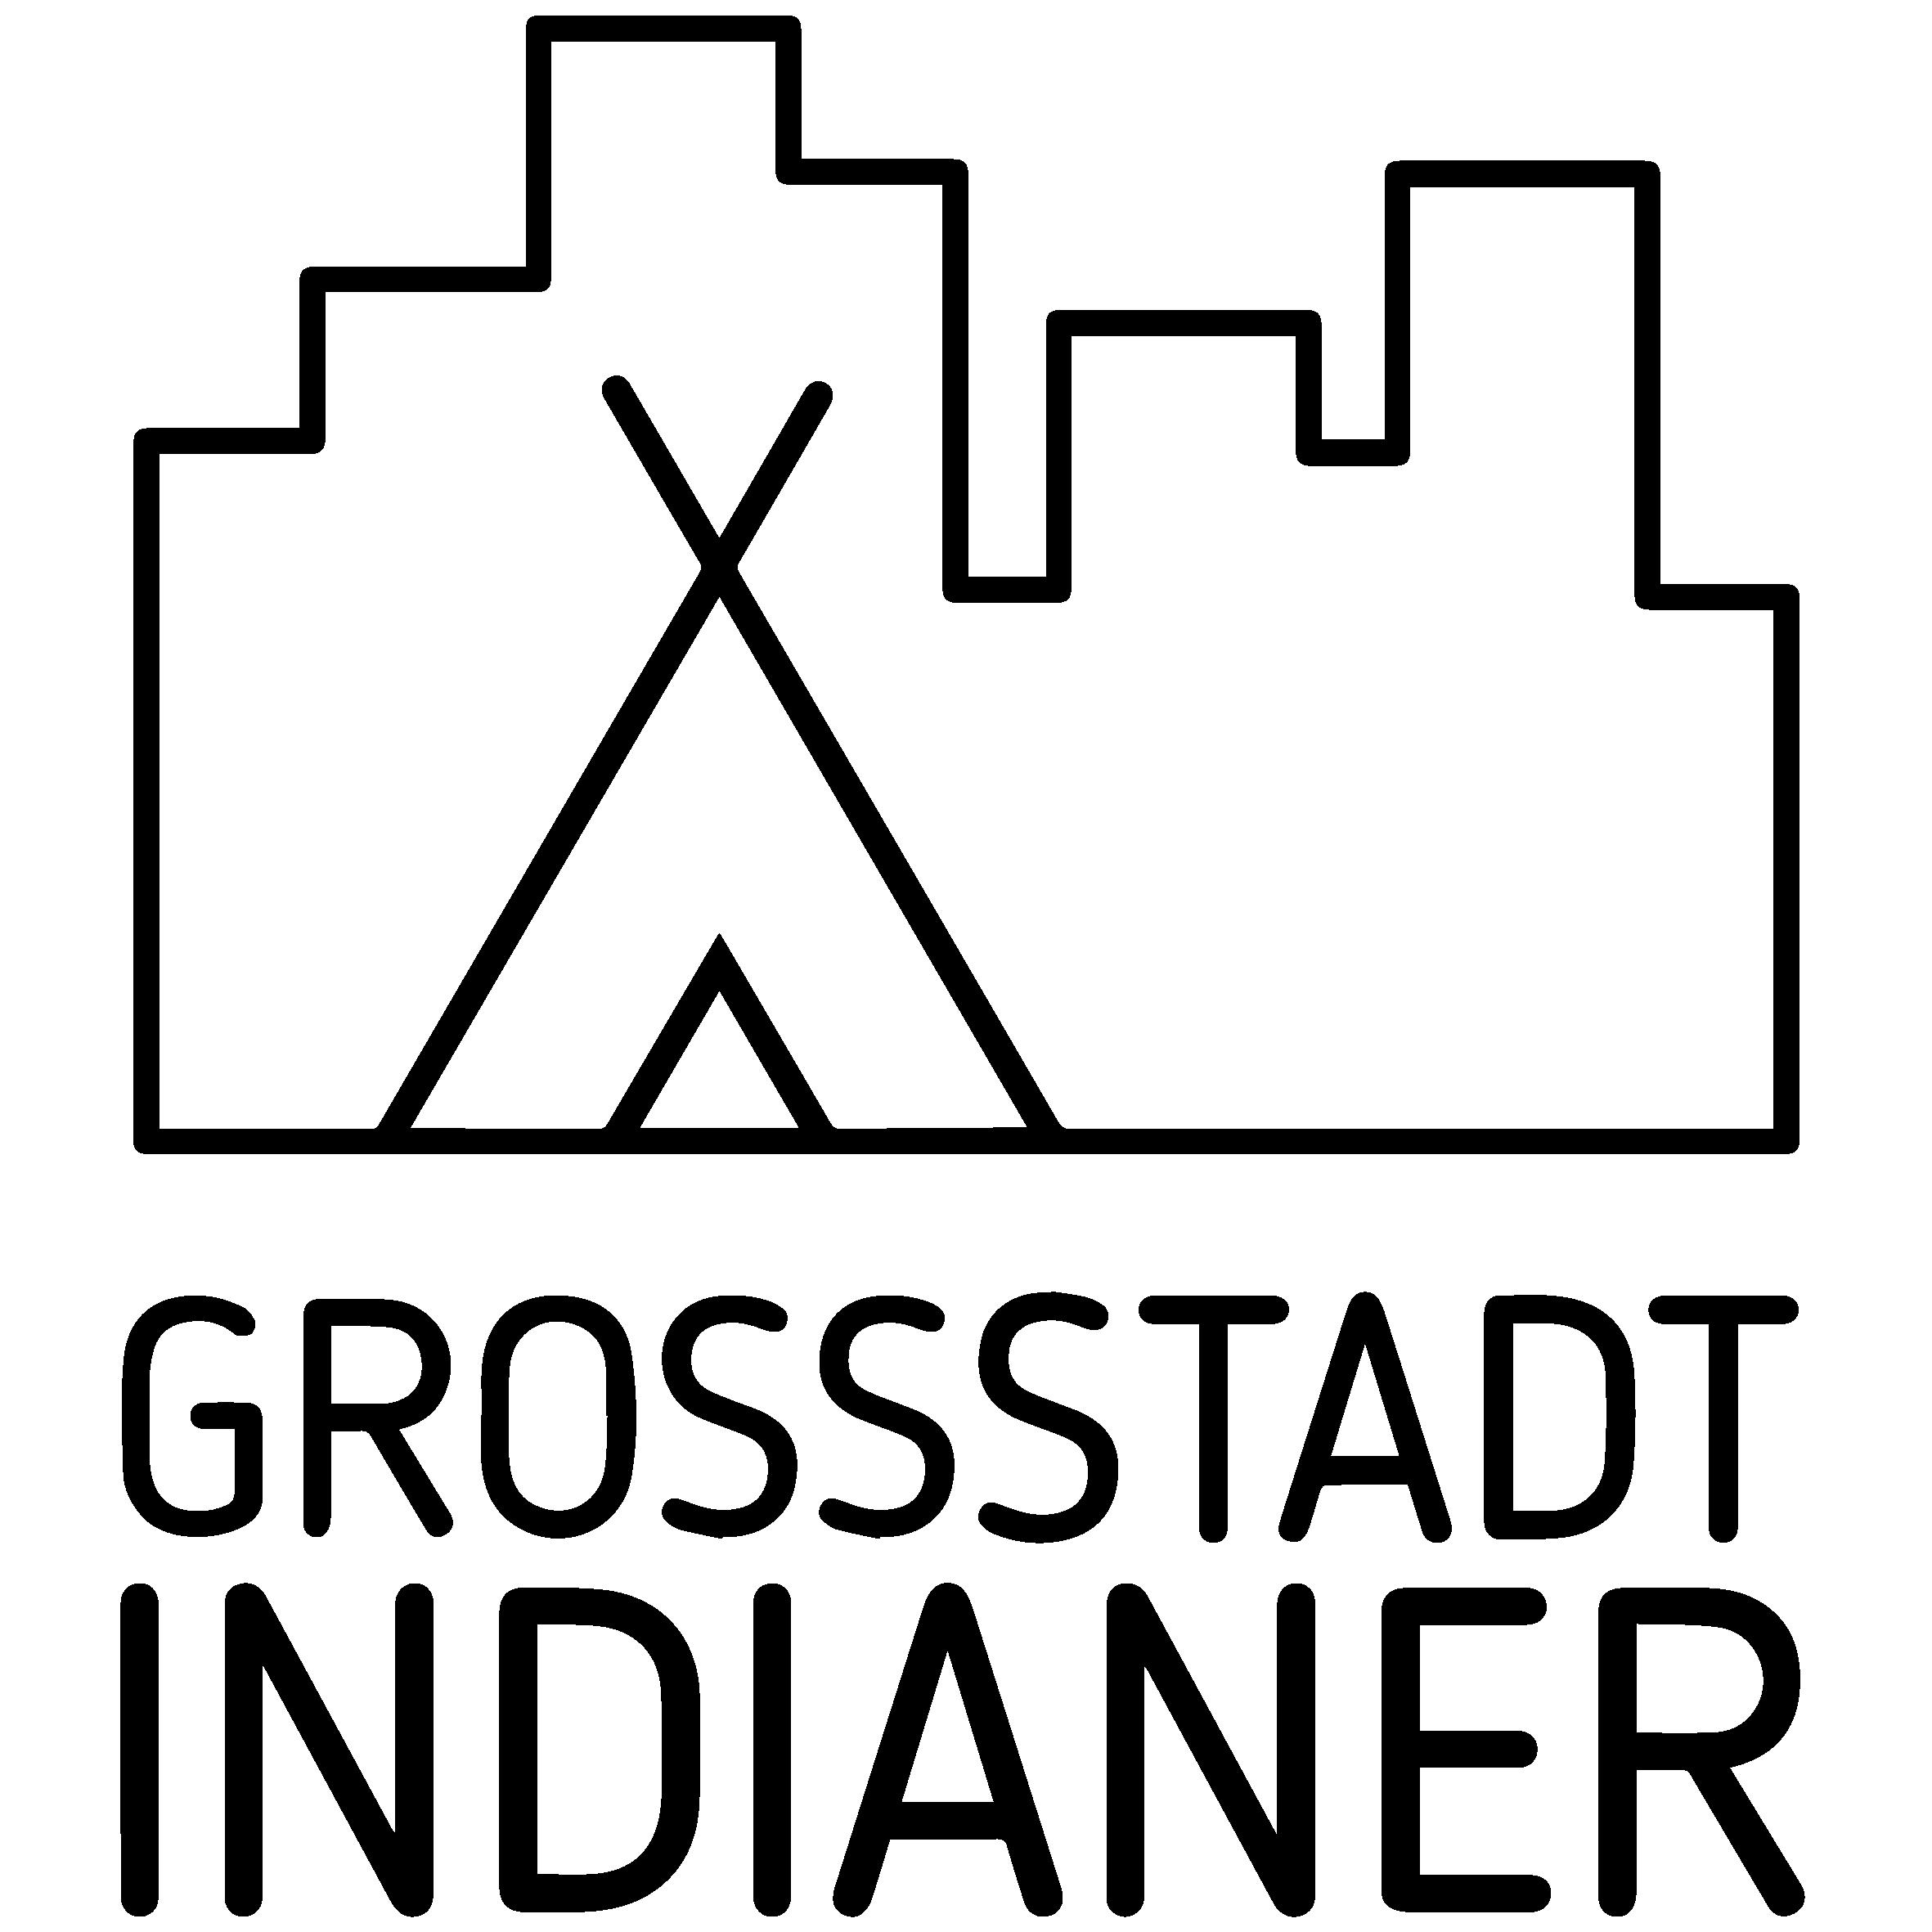 Grossstadtindianer